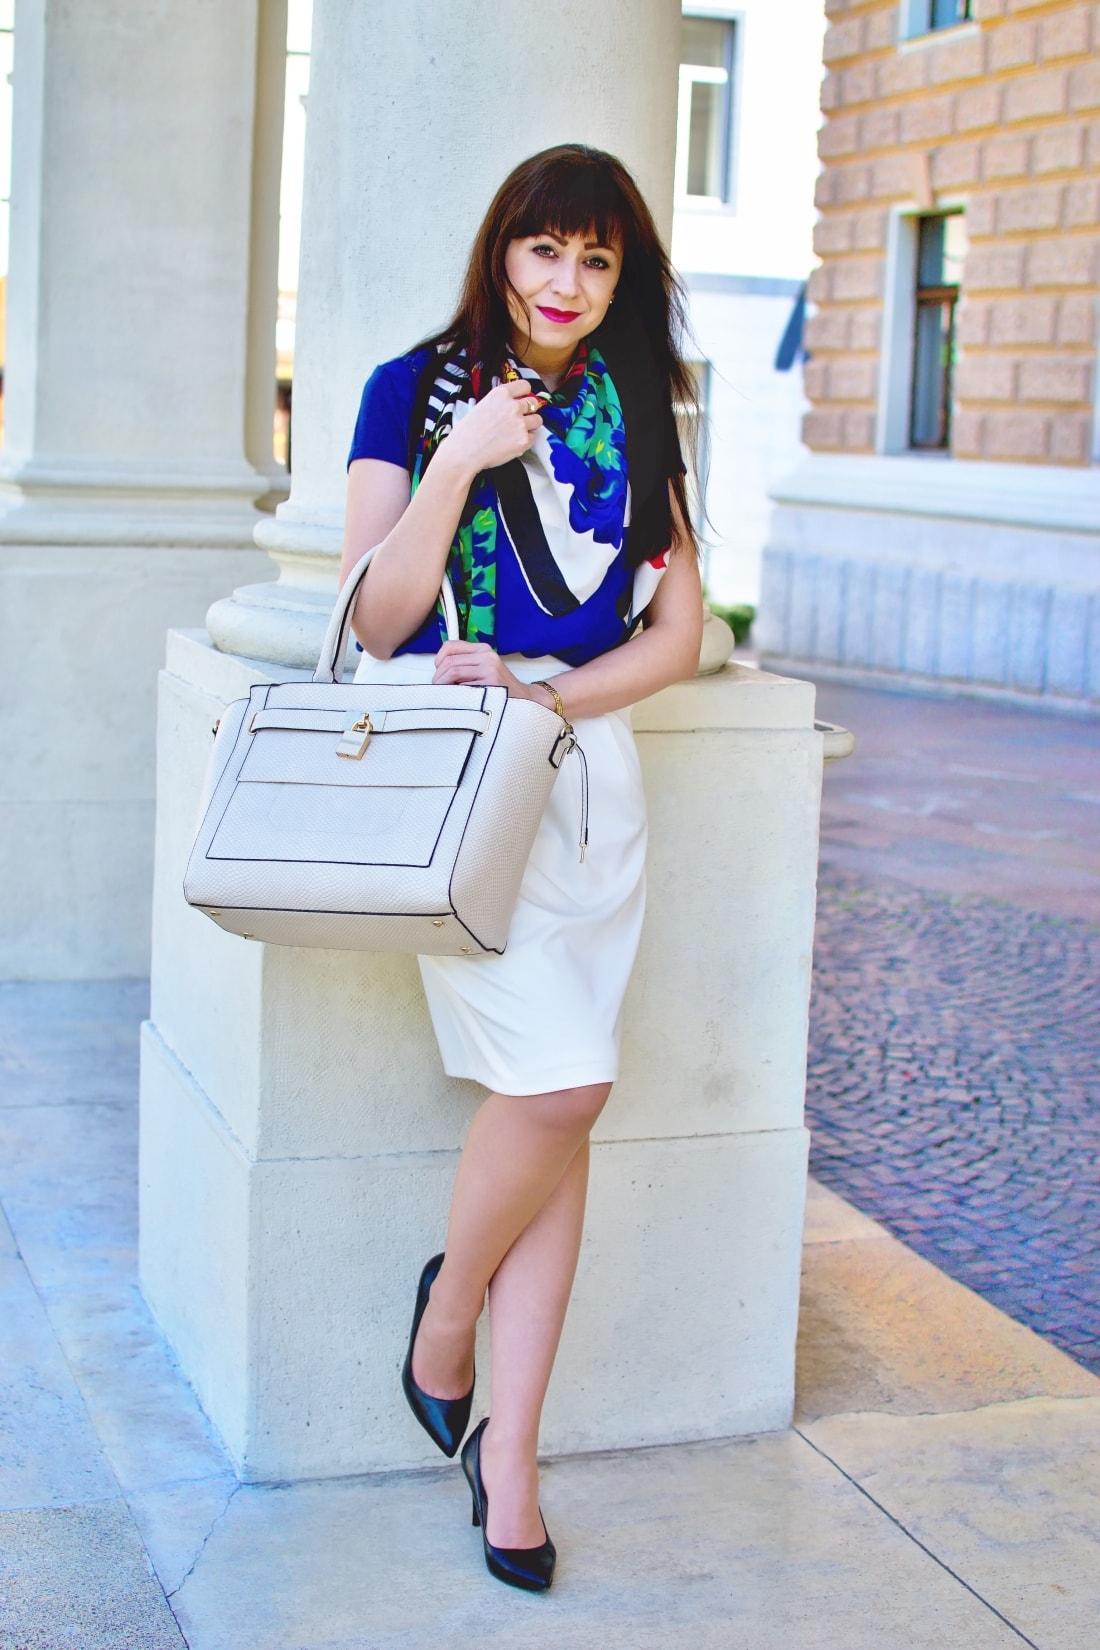 katharine-fashion-is-beautiful-blog-mix-kvetov-a-satka-5-blogger